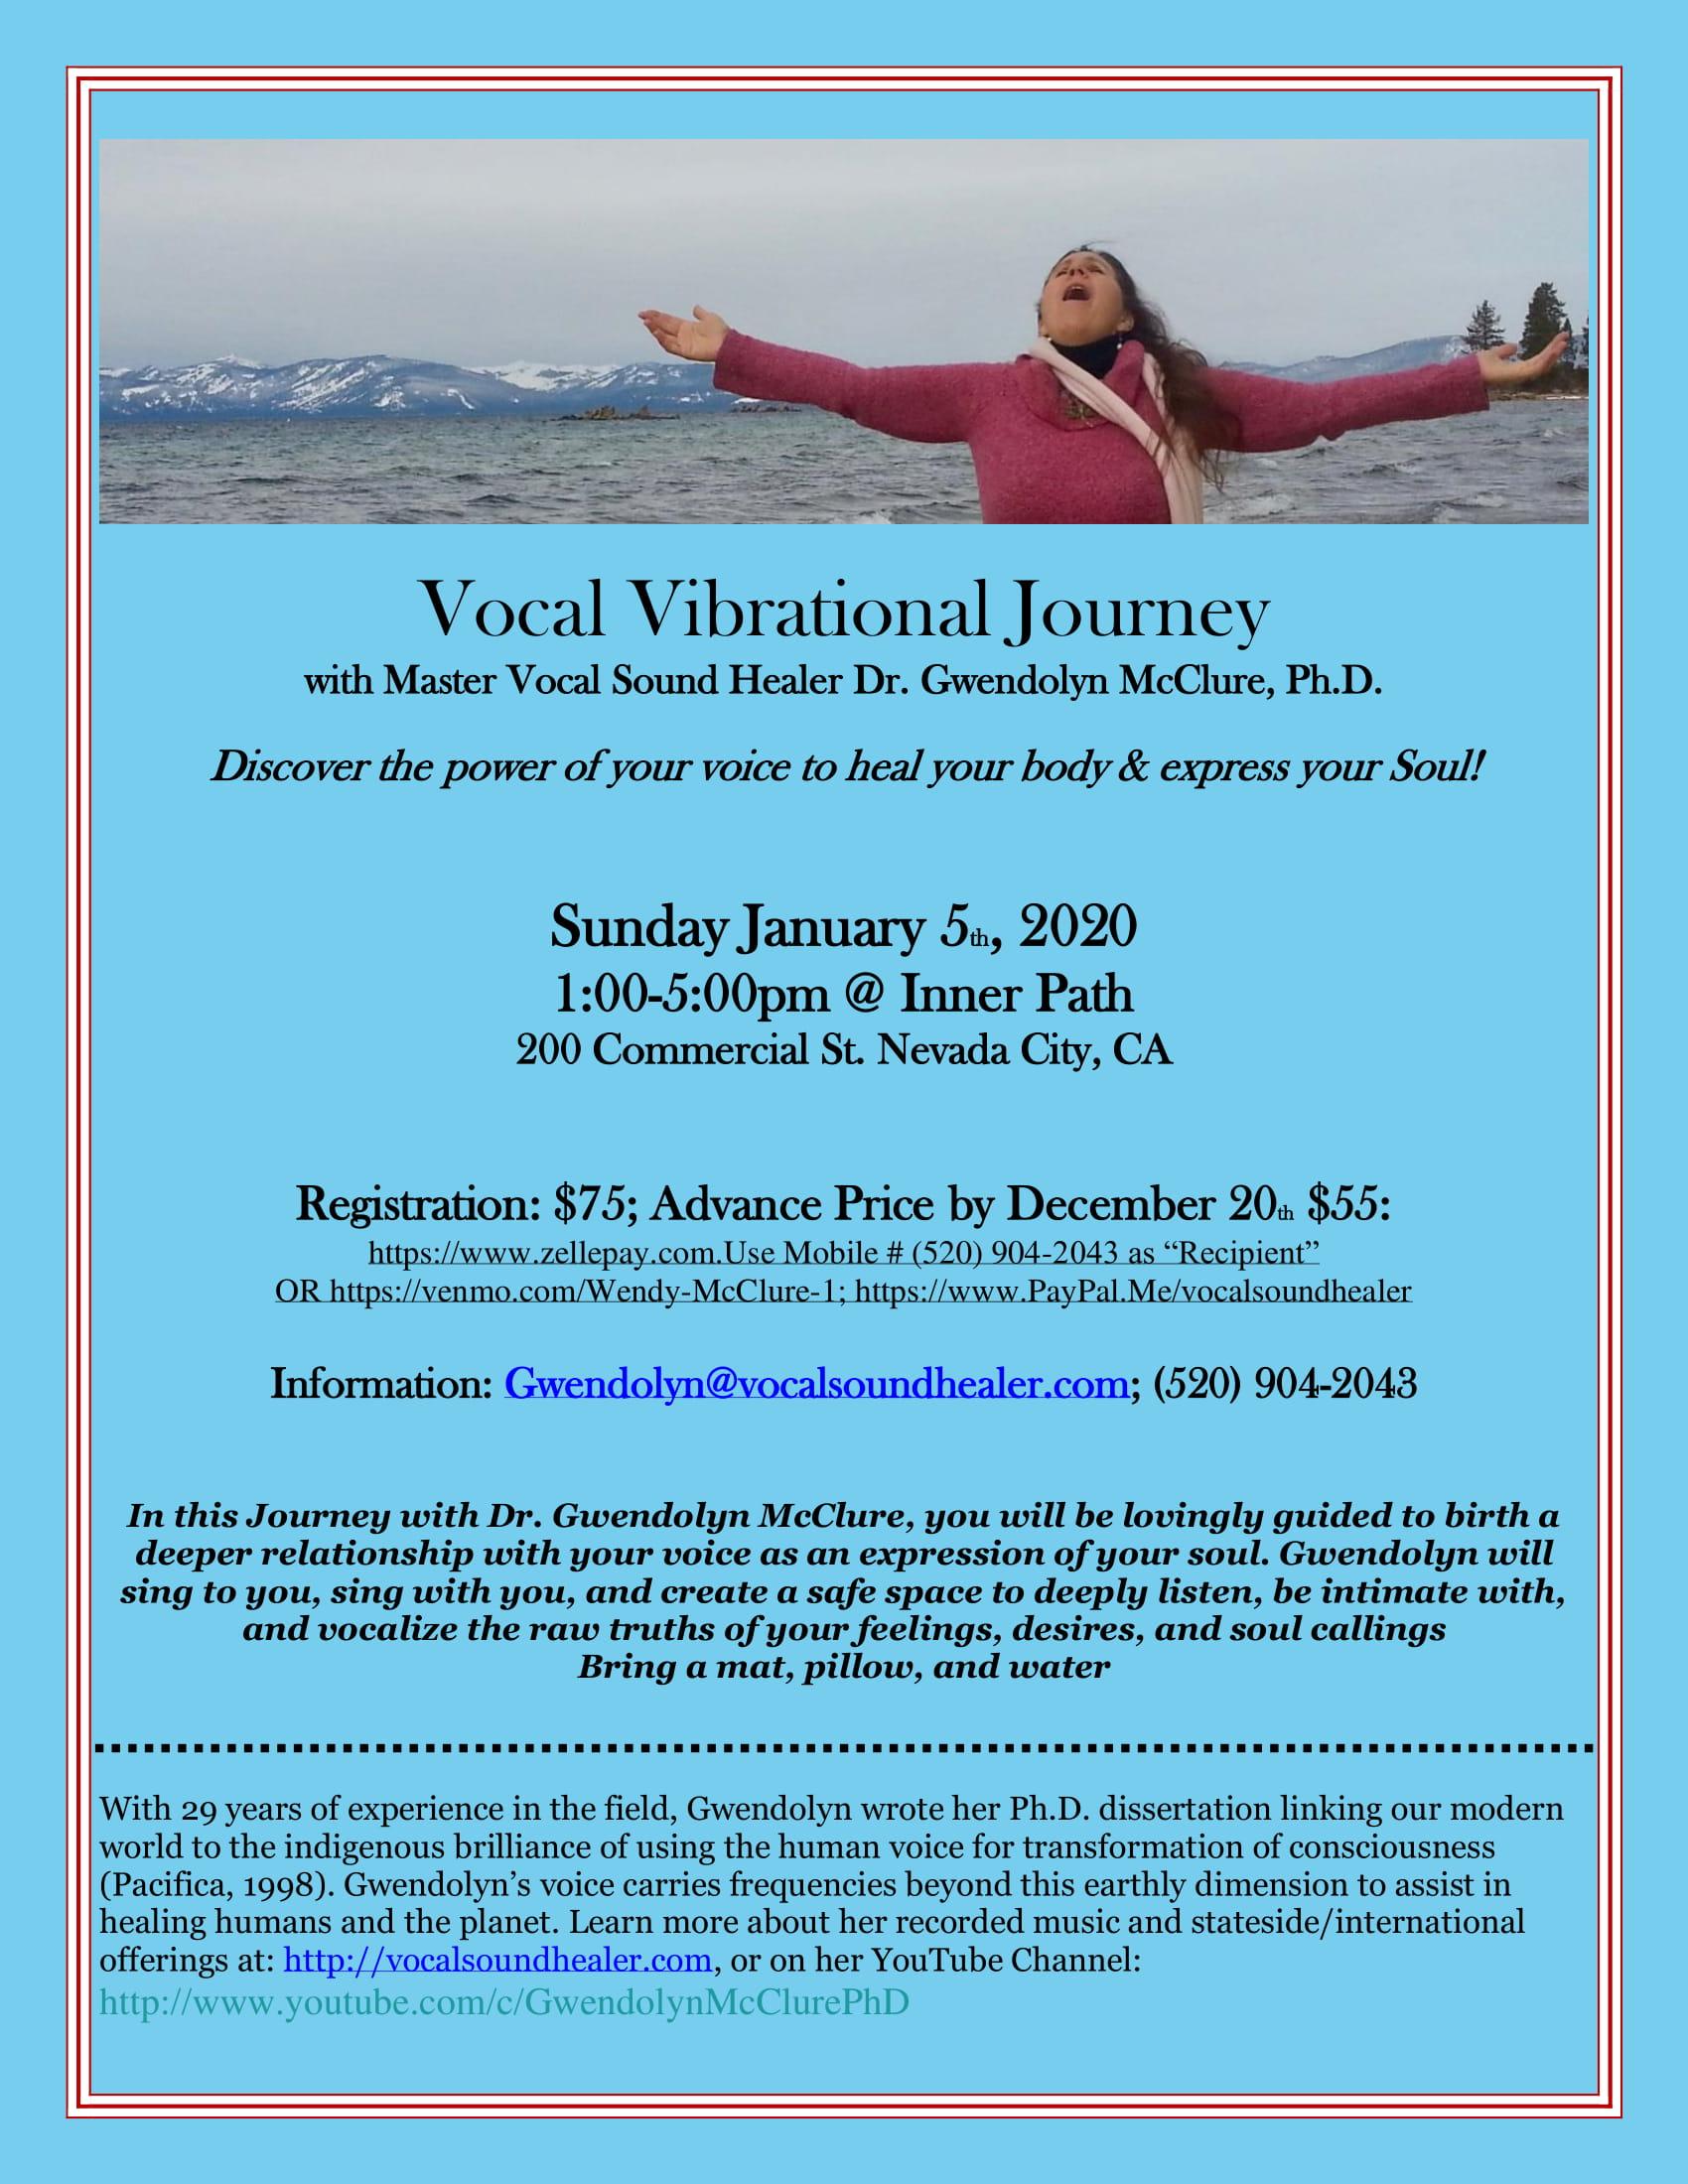 NevadaCity1.5.20Vocal Vibrational Journey-1 2